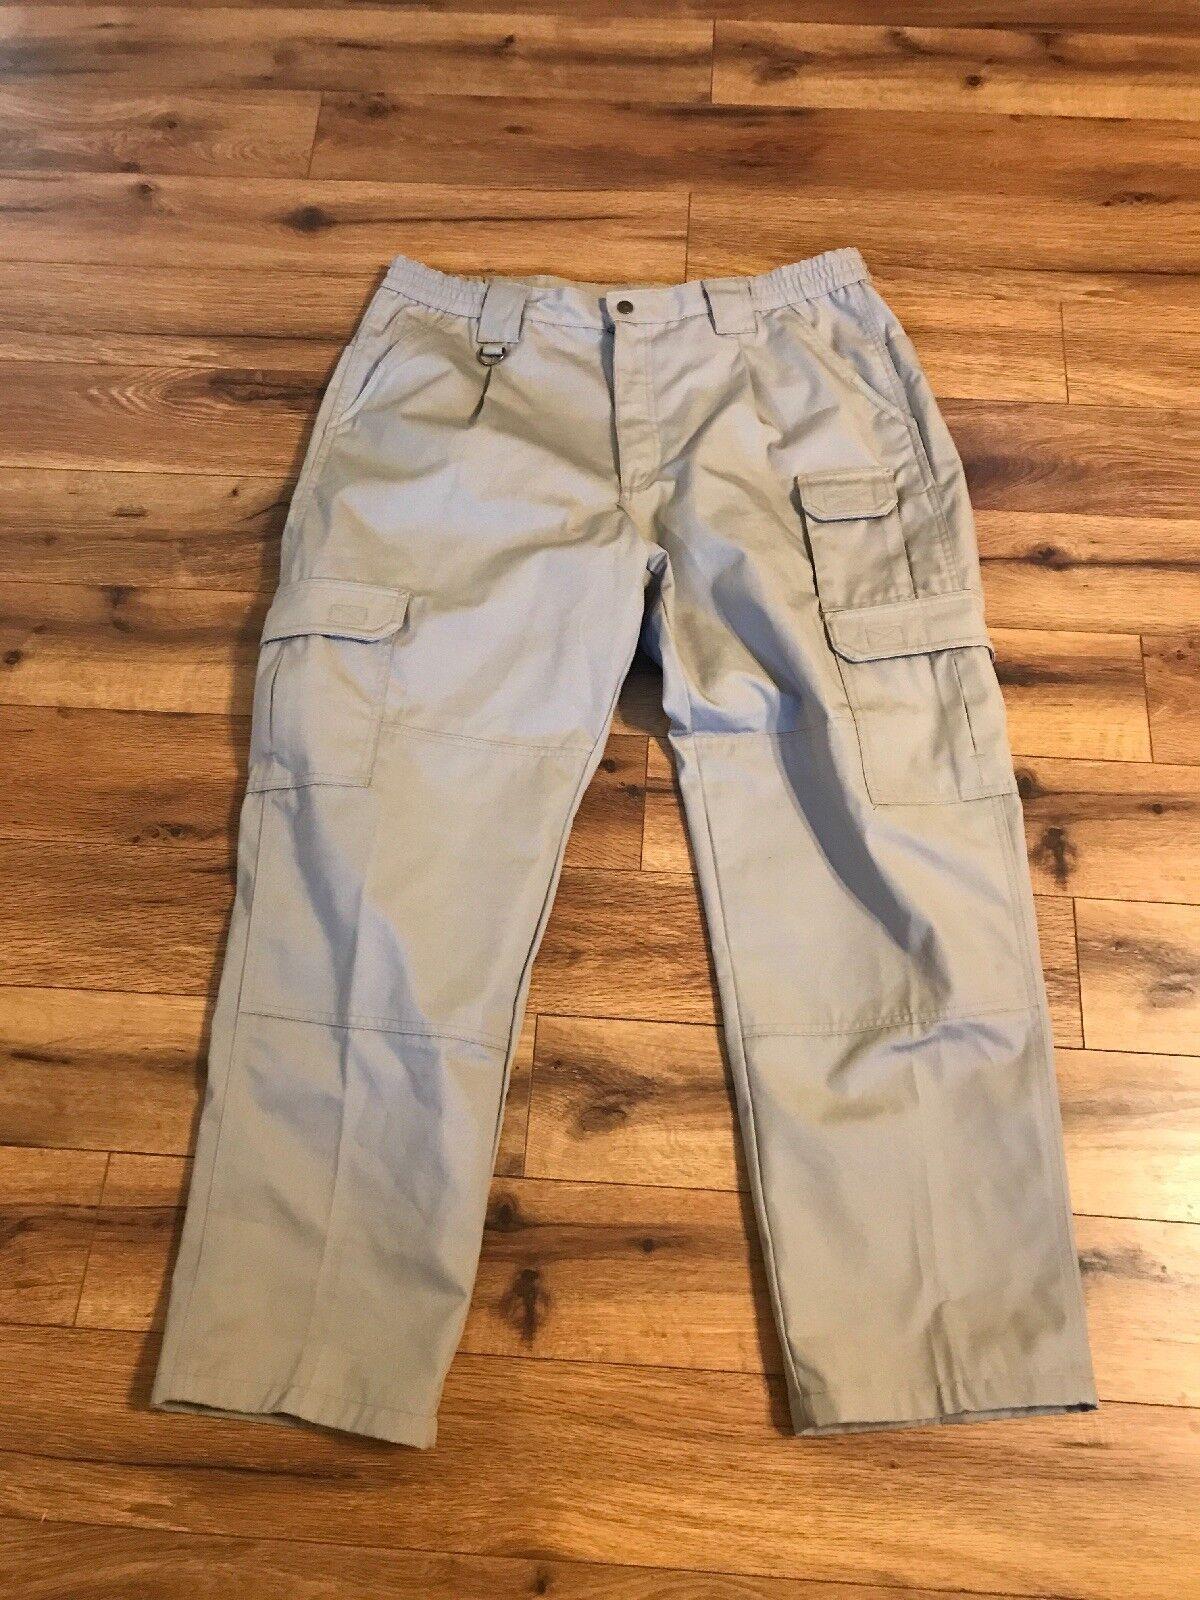 Propper Tactical Pants Tan 40x30 Work Wear